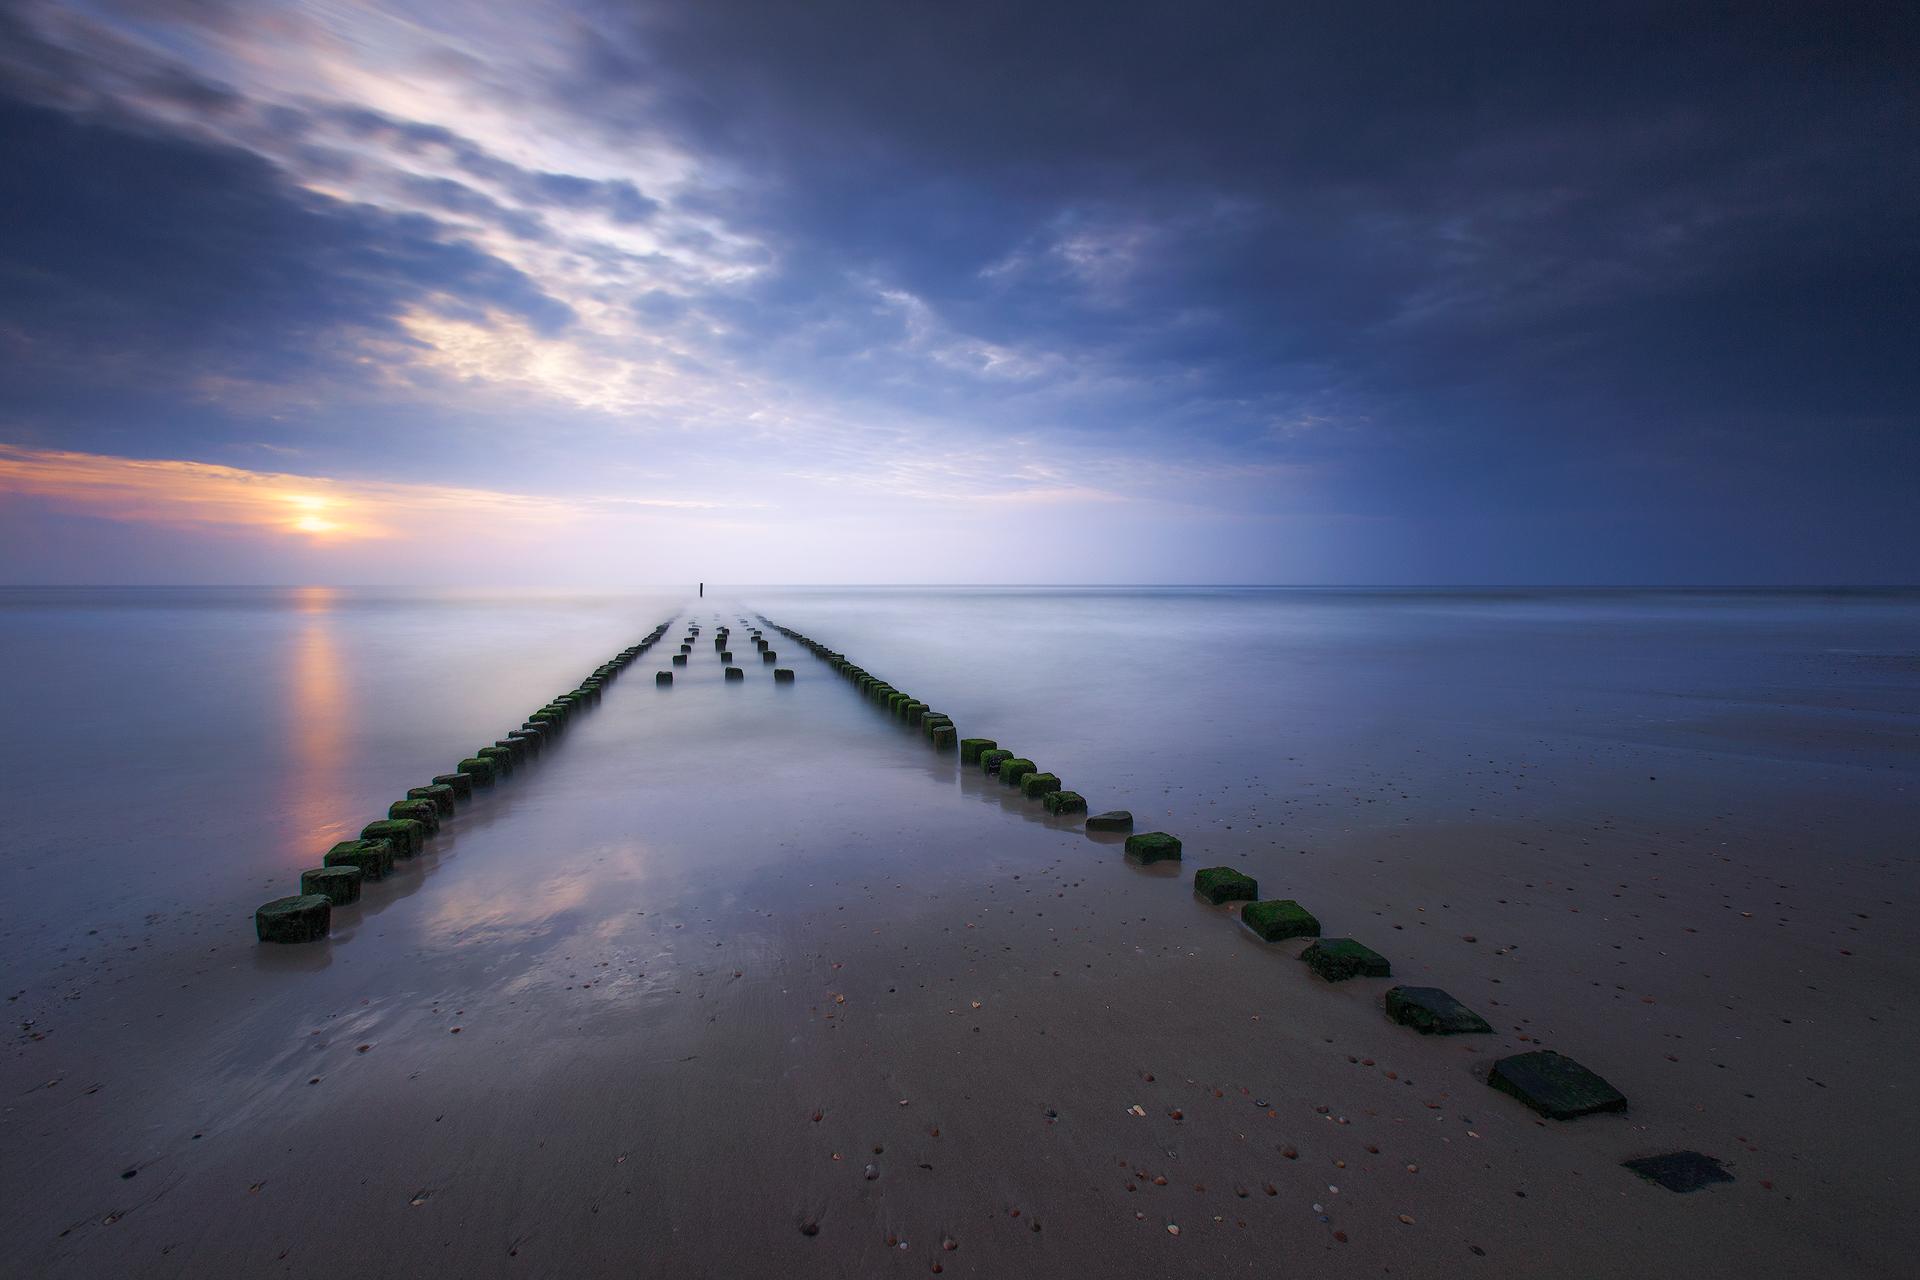 A calm evening (Westkapelle, The Netherlands)